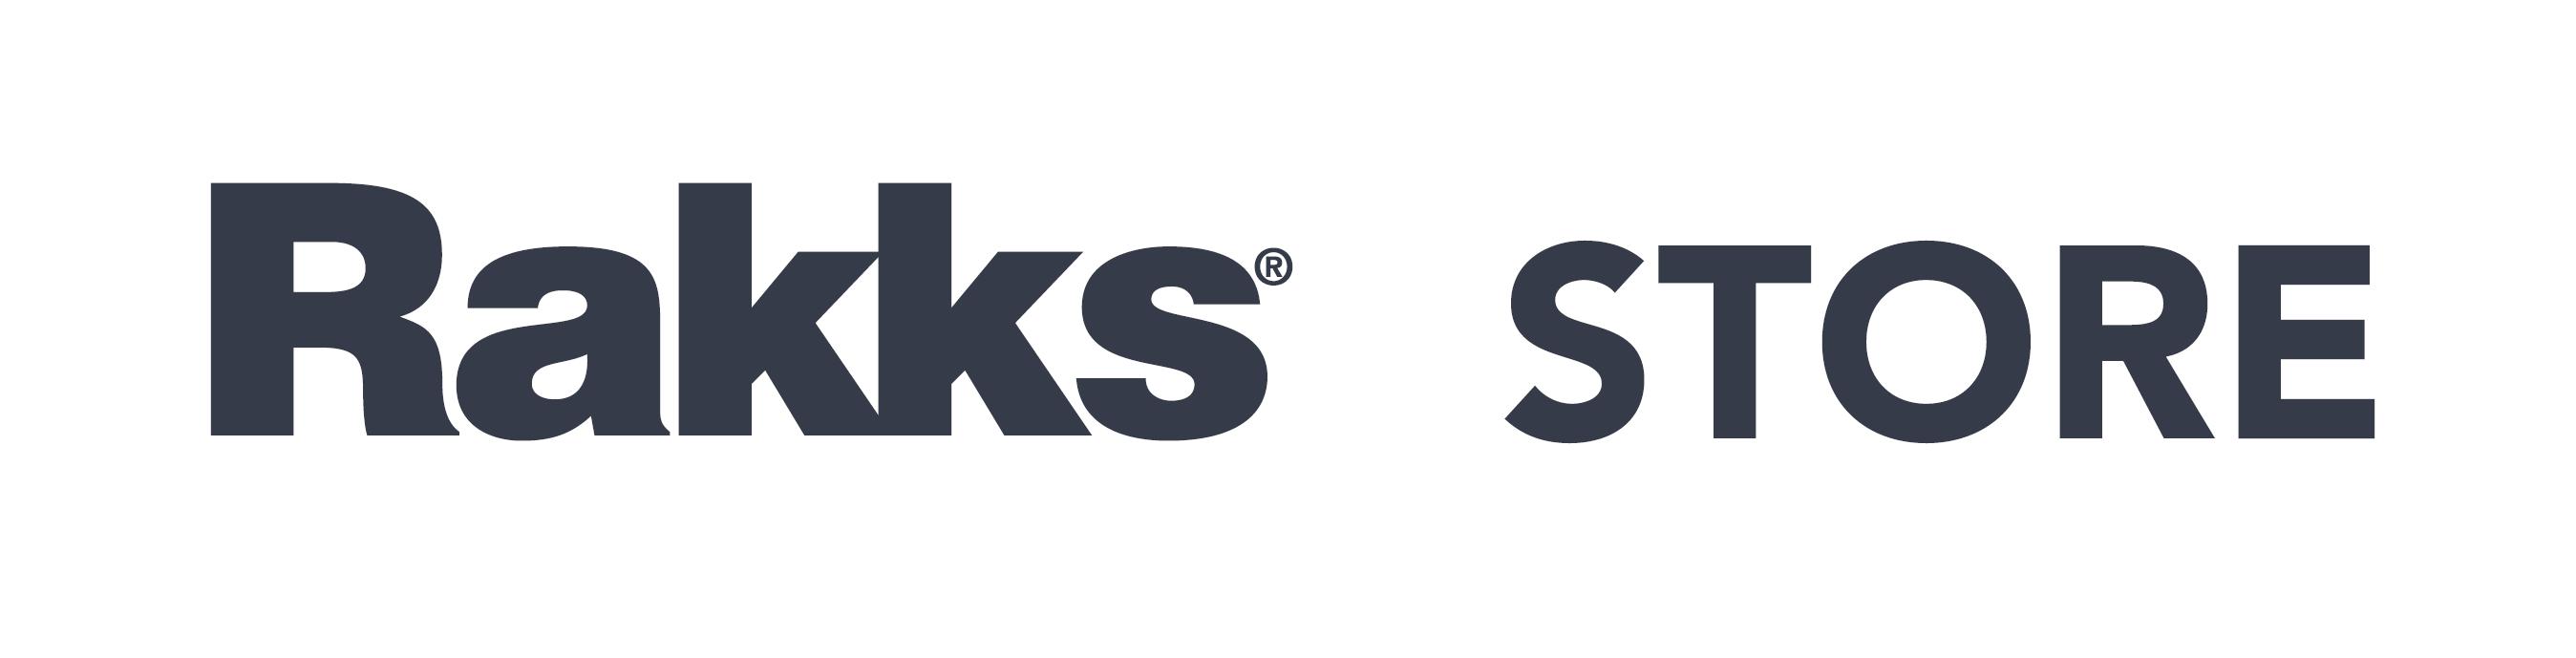 Rakks Store